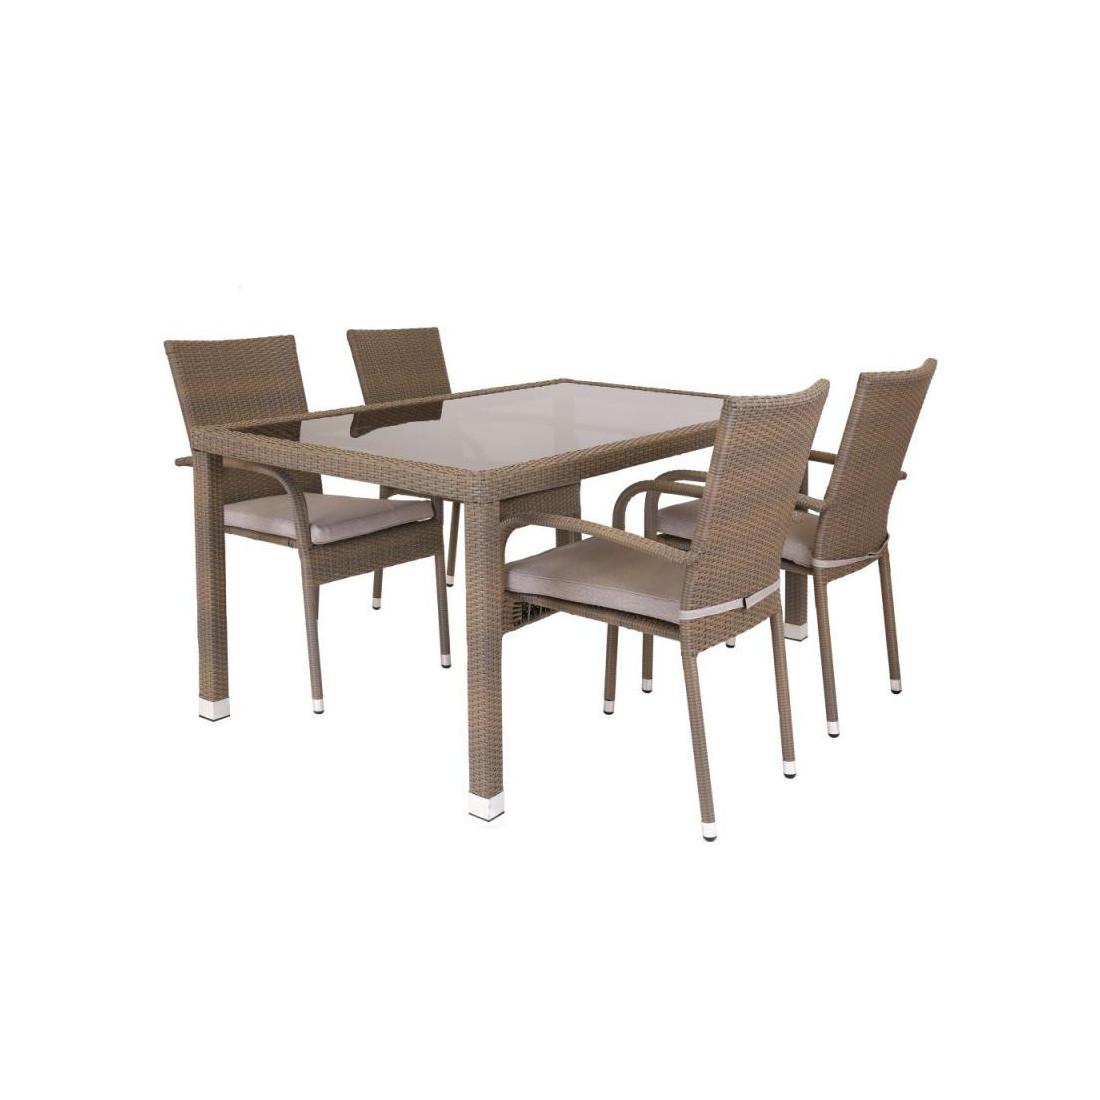 table de repas rectangulaire rotin taupe verre baros. Black Bedroom Furniture Sets. Home Design Ideas